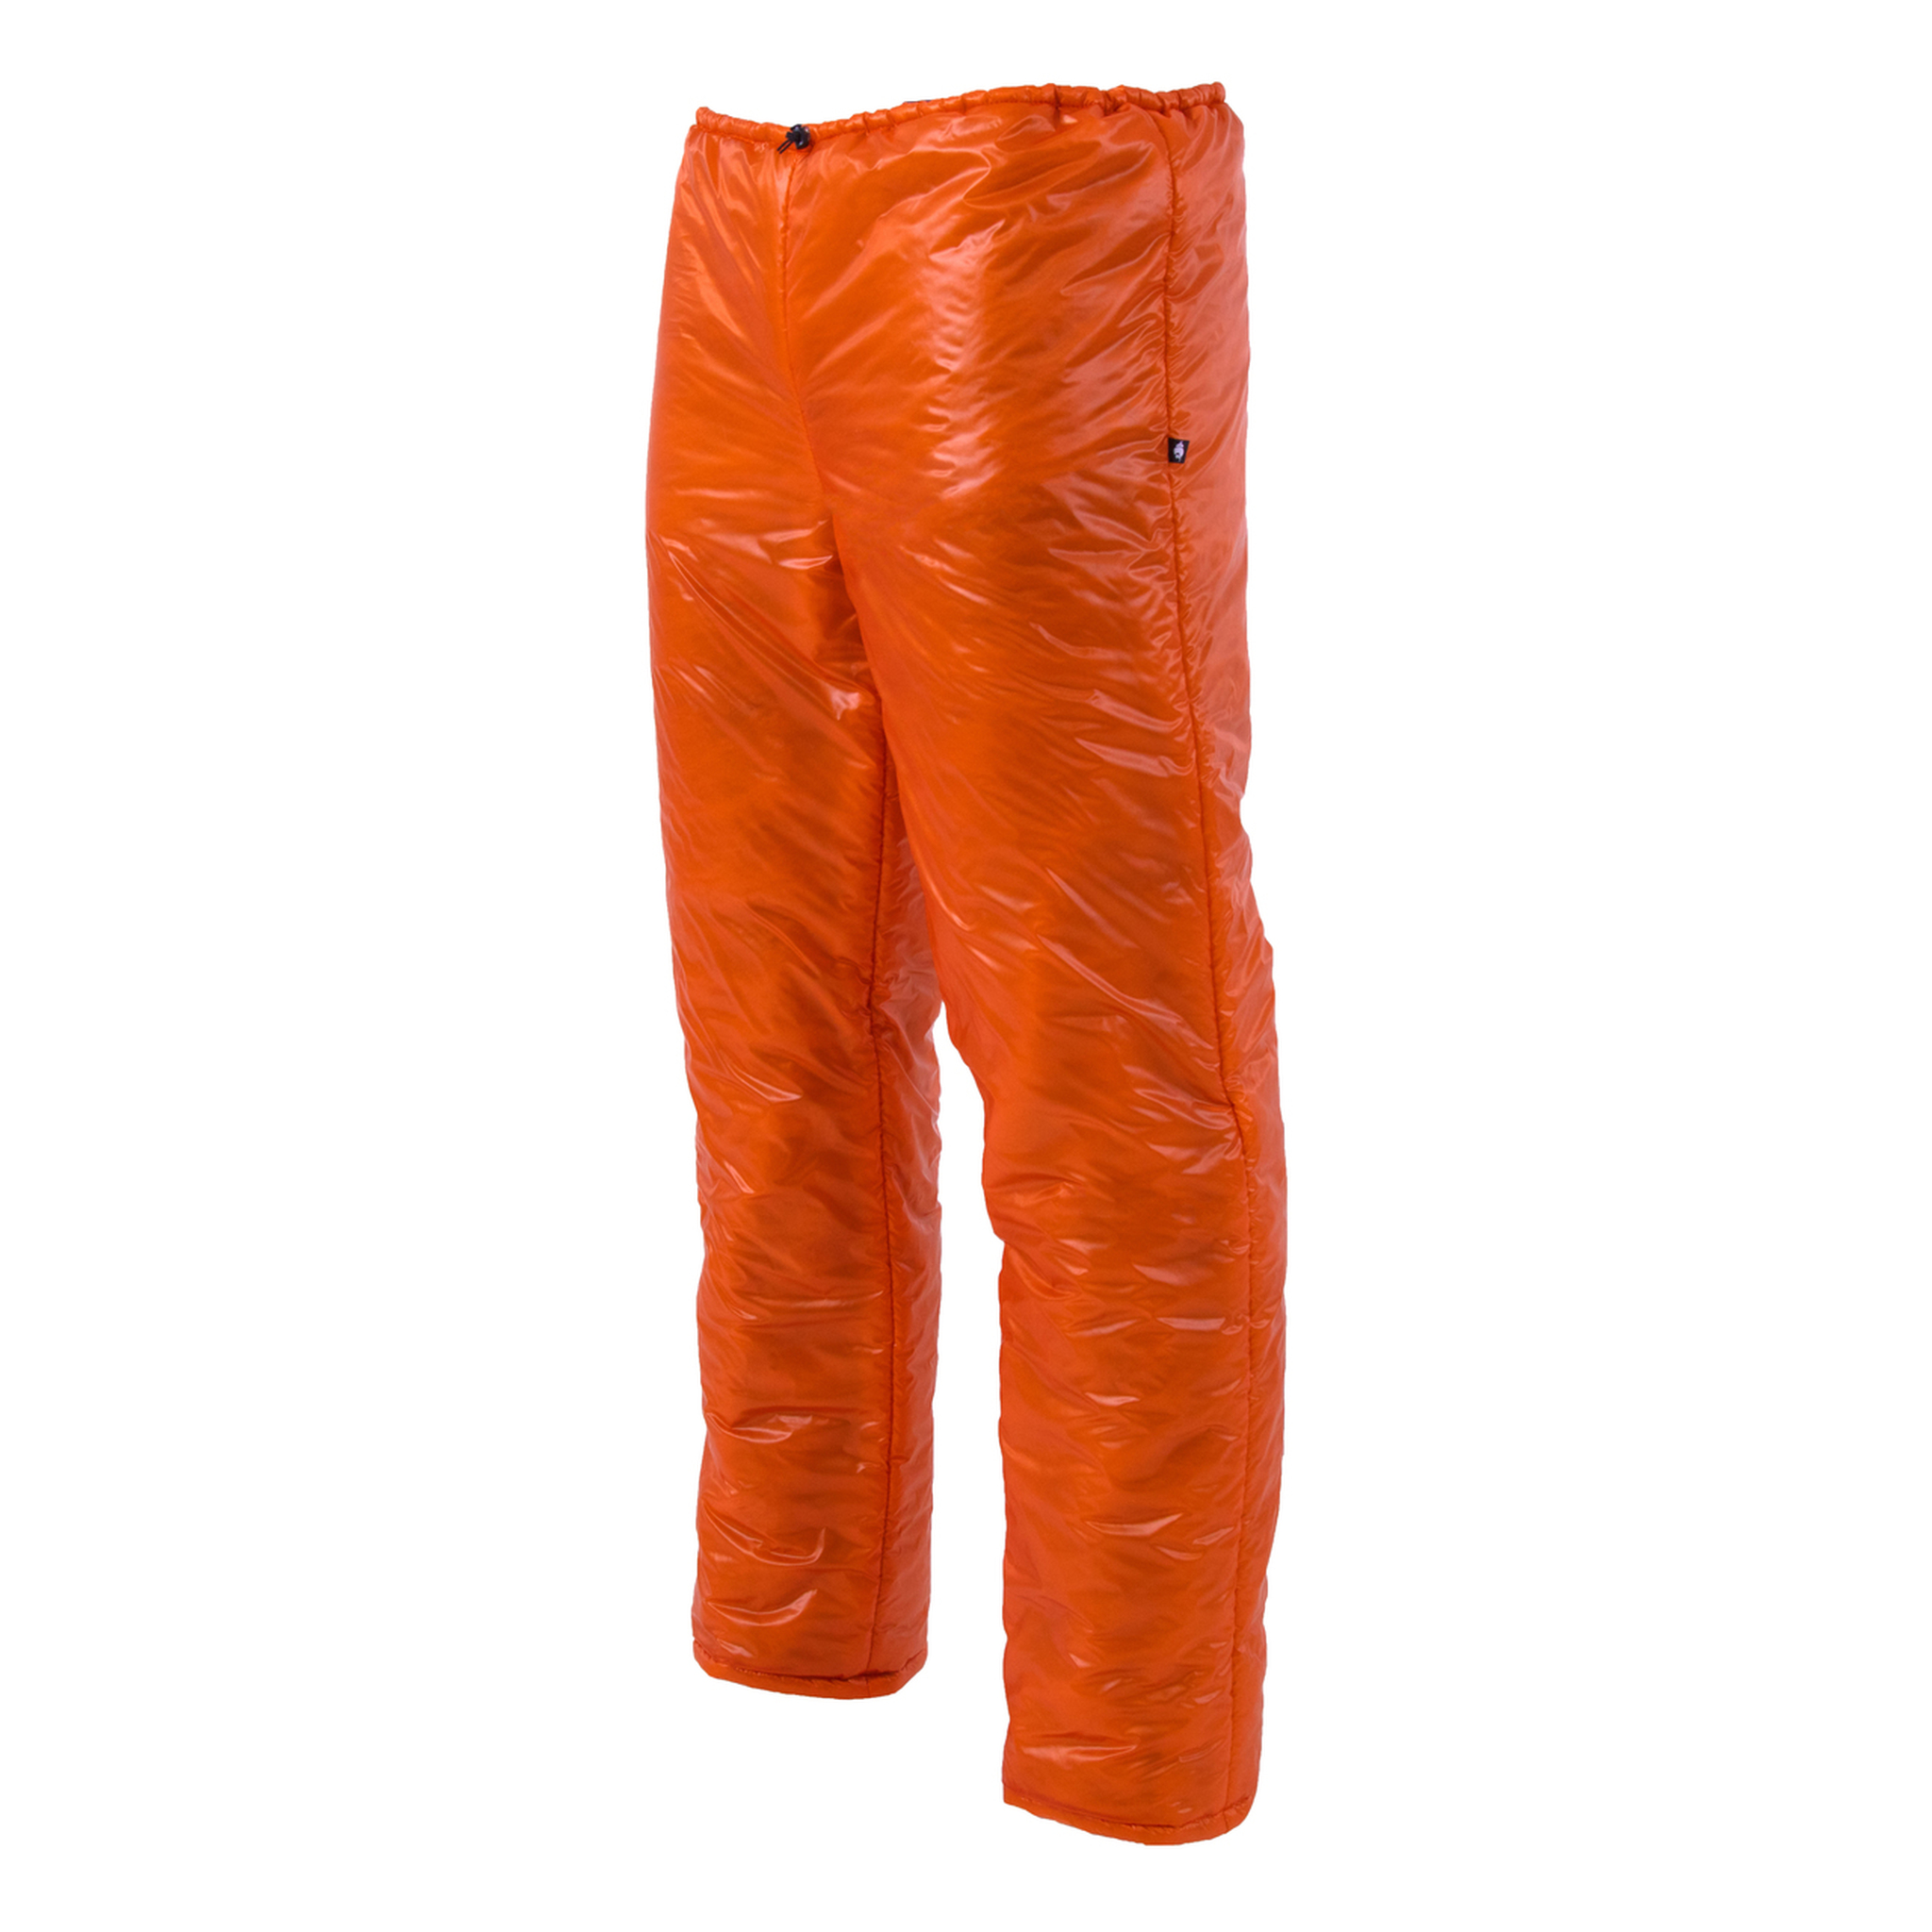 Powerslide Ps Warm-Up Zip Trousers Size 2XS